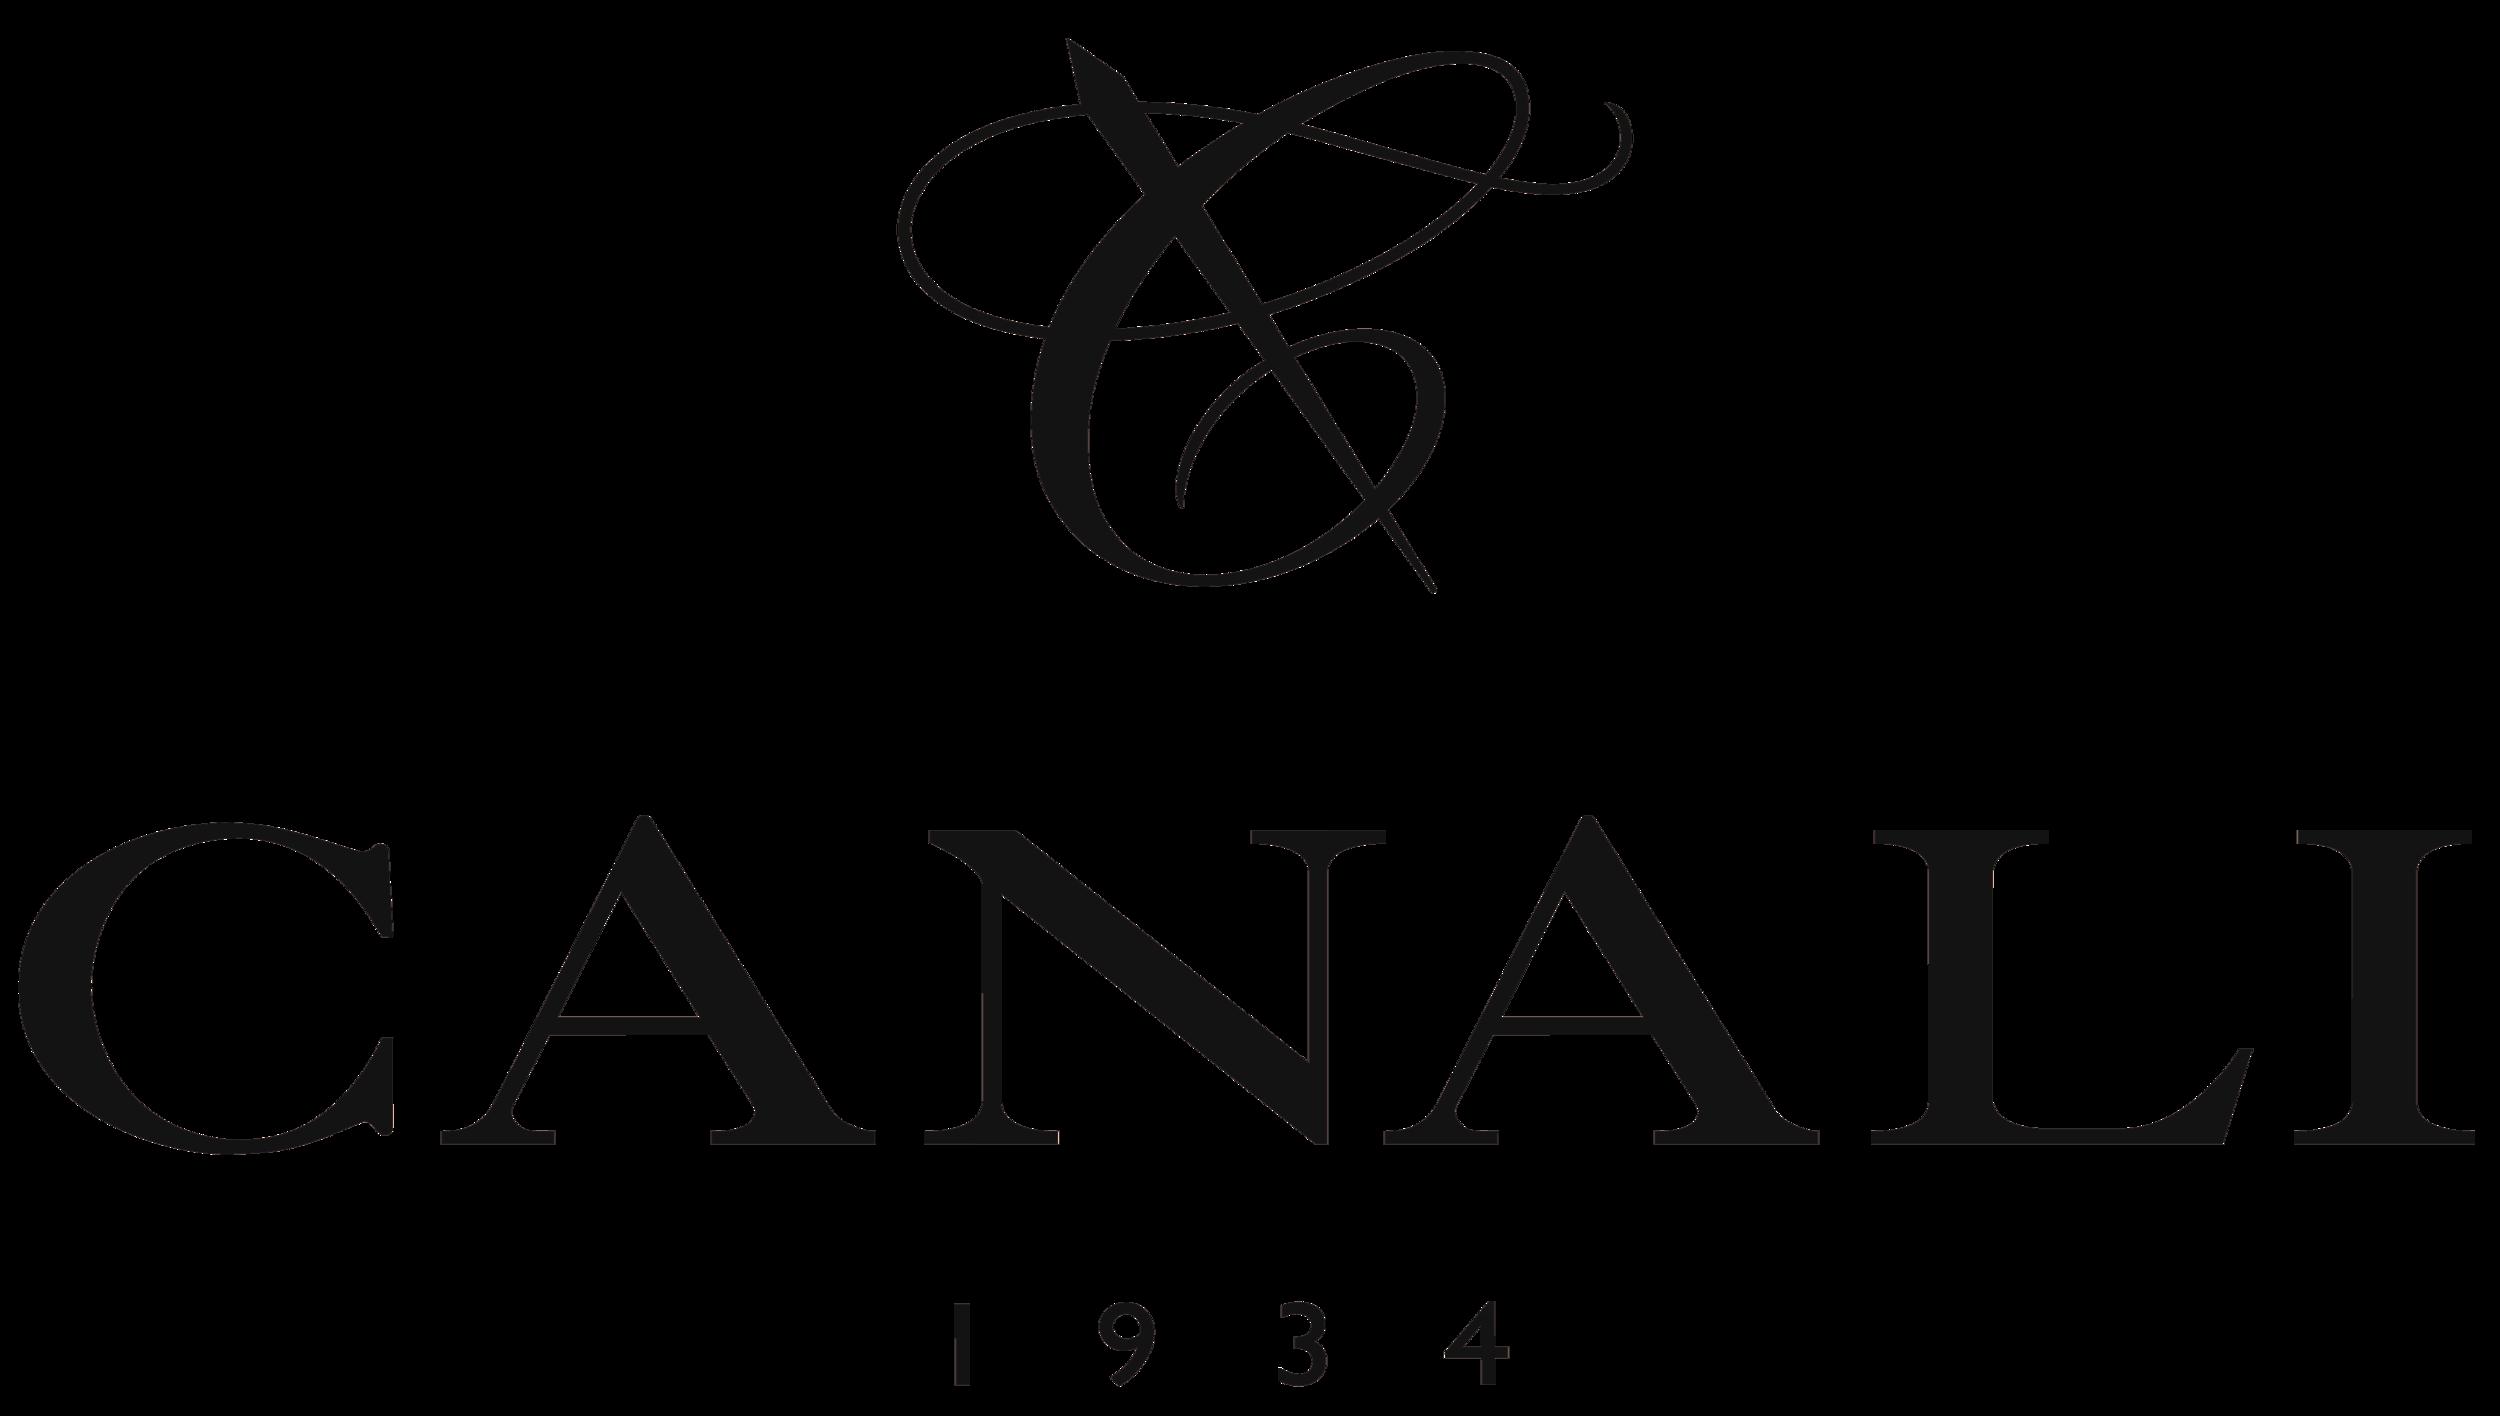 Canali_logo_logotype_emblem.png